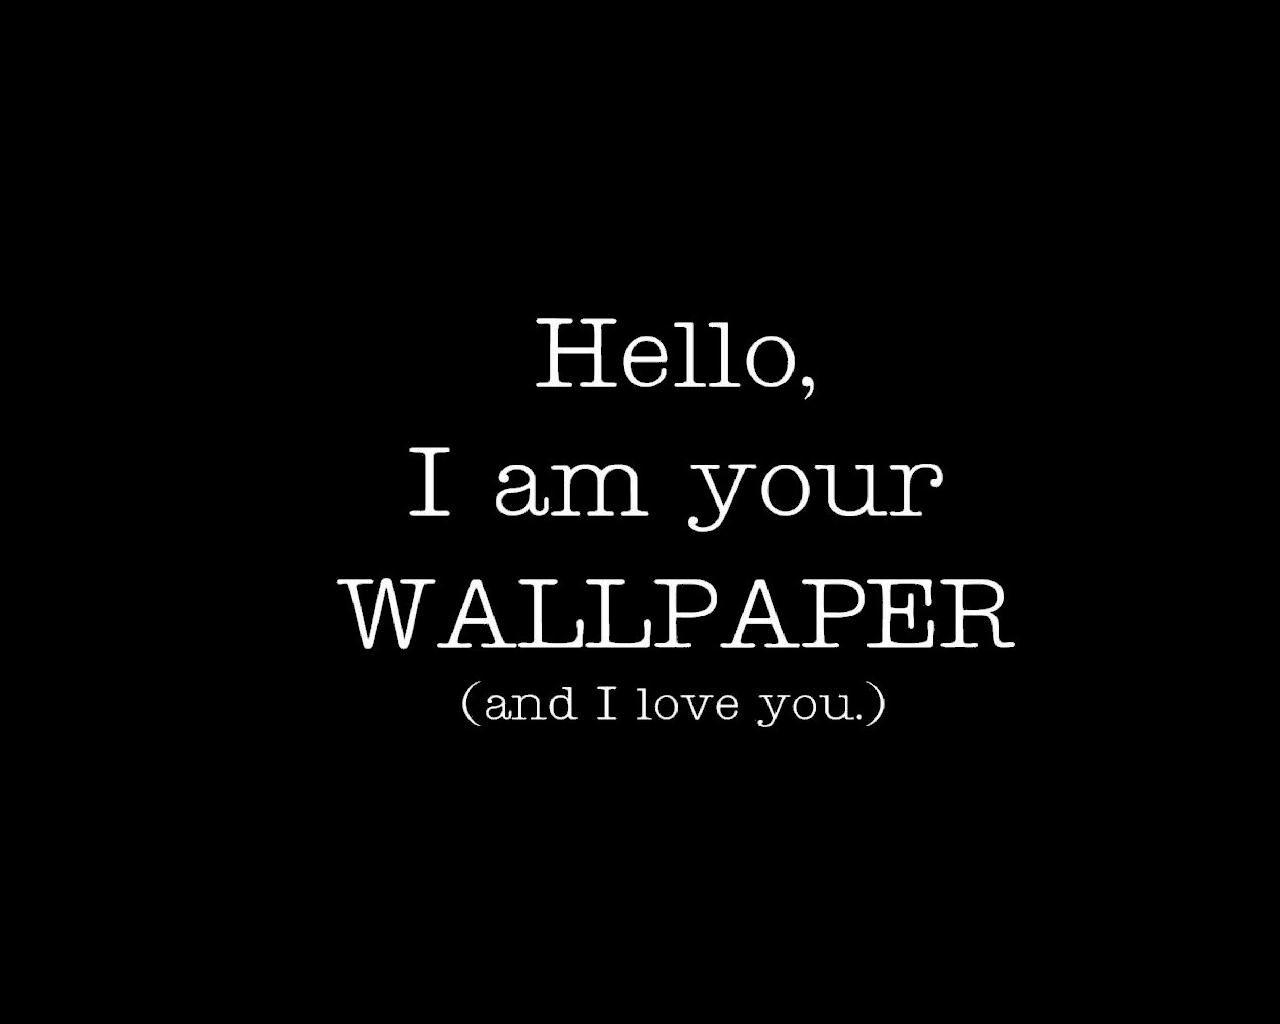 funny computer wallpapers, desktop backgrounds | 1280x1024 | id